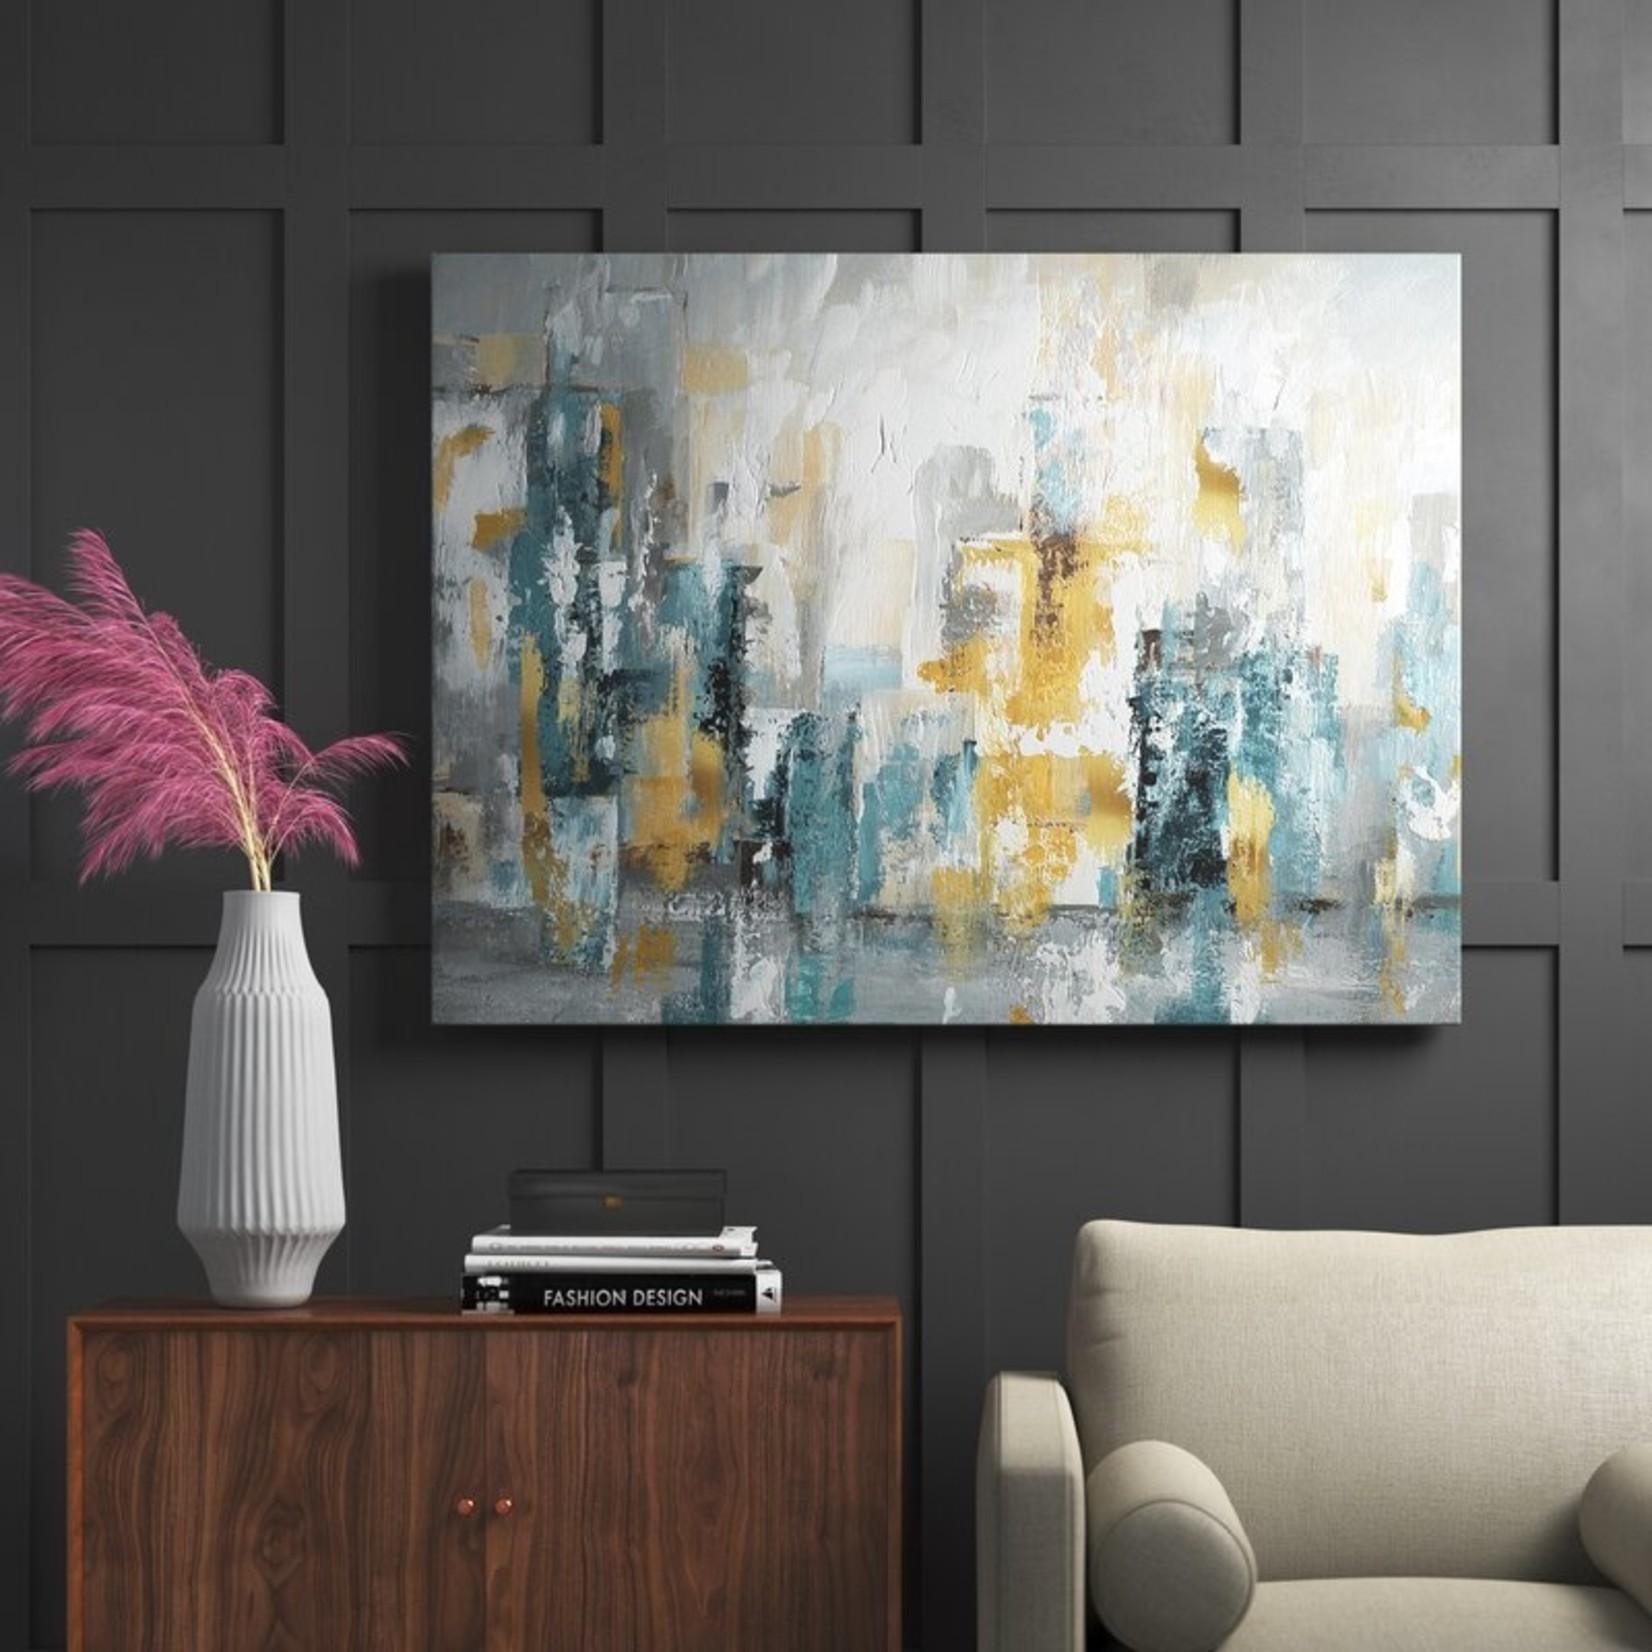 "*'City Views II' - Painting Print on Canvas - 8"" x 12"""